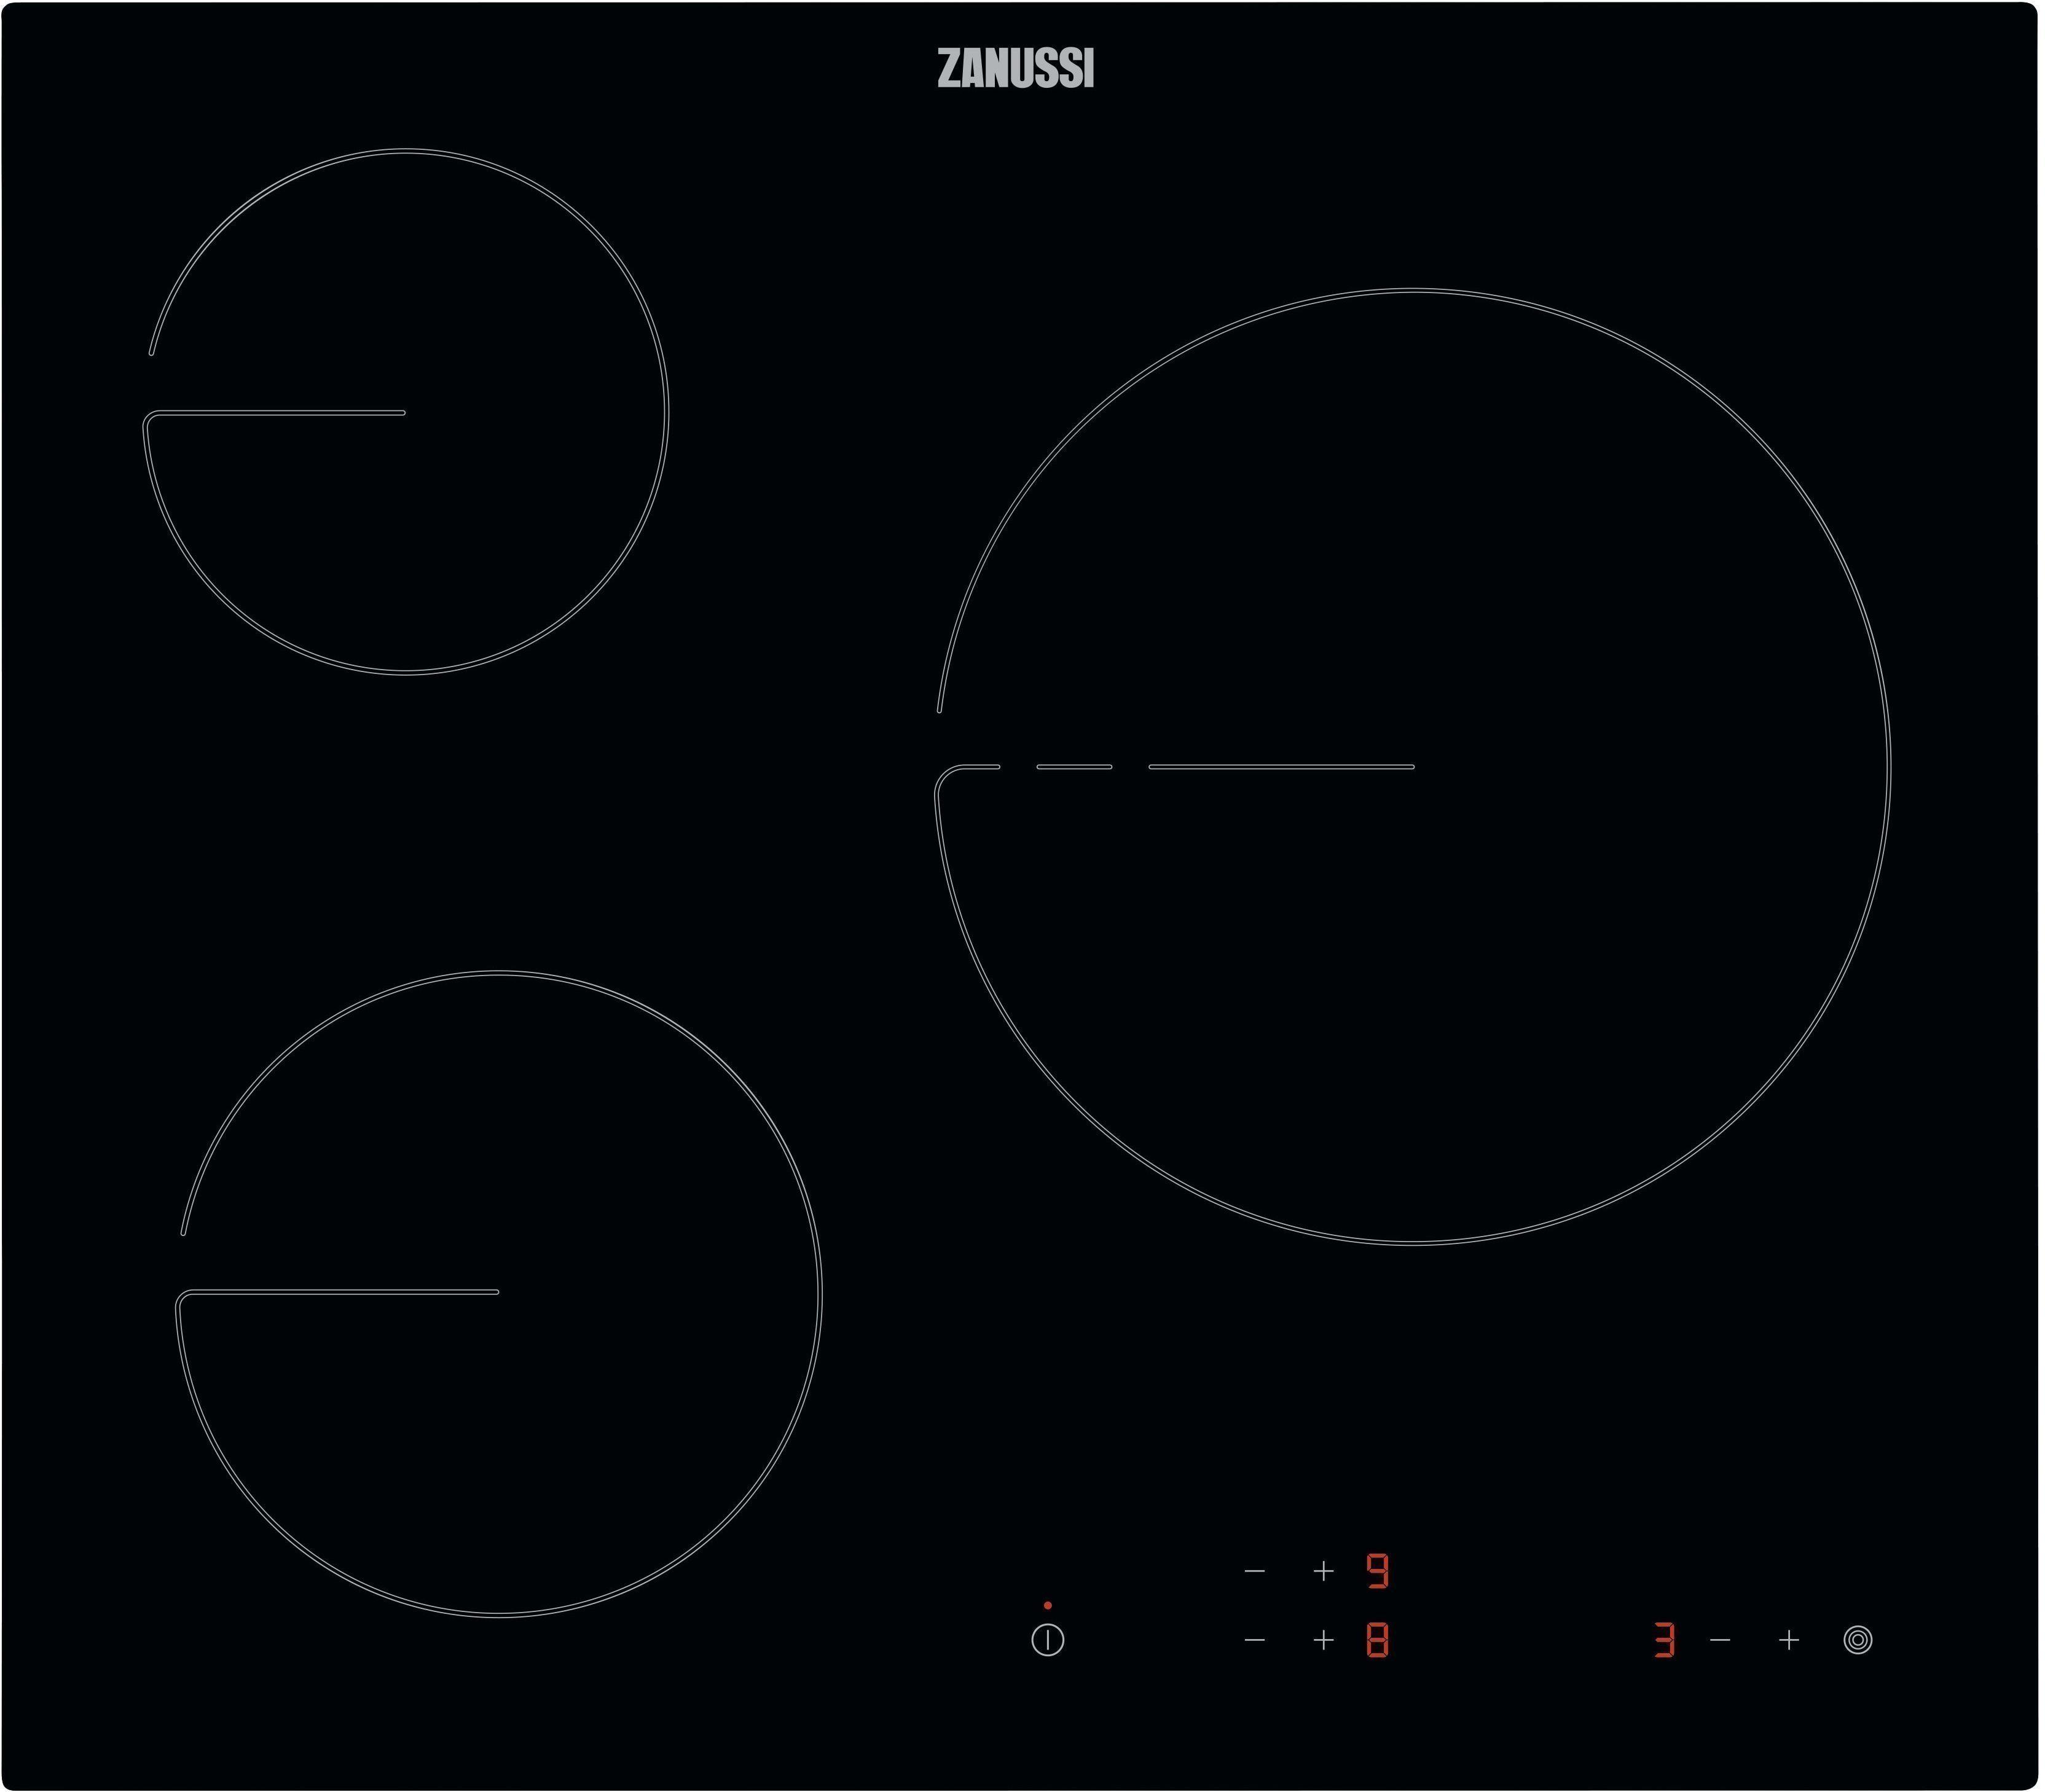 Placa Zanussi ZHRK639K 3vitro Touch Sin Marco